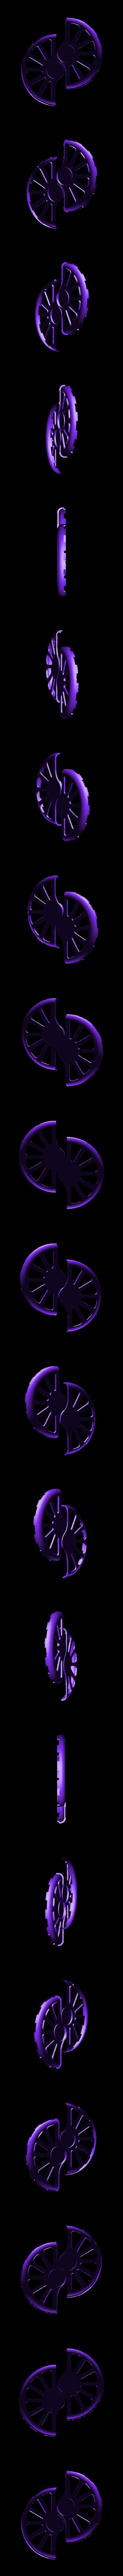 spinner_holder_half_lighten.stl Download free STL file Spinner Holder • 3D printable template, CyberCyclist